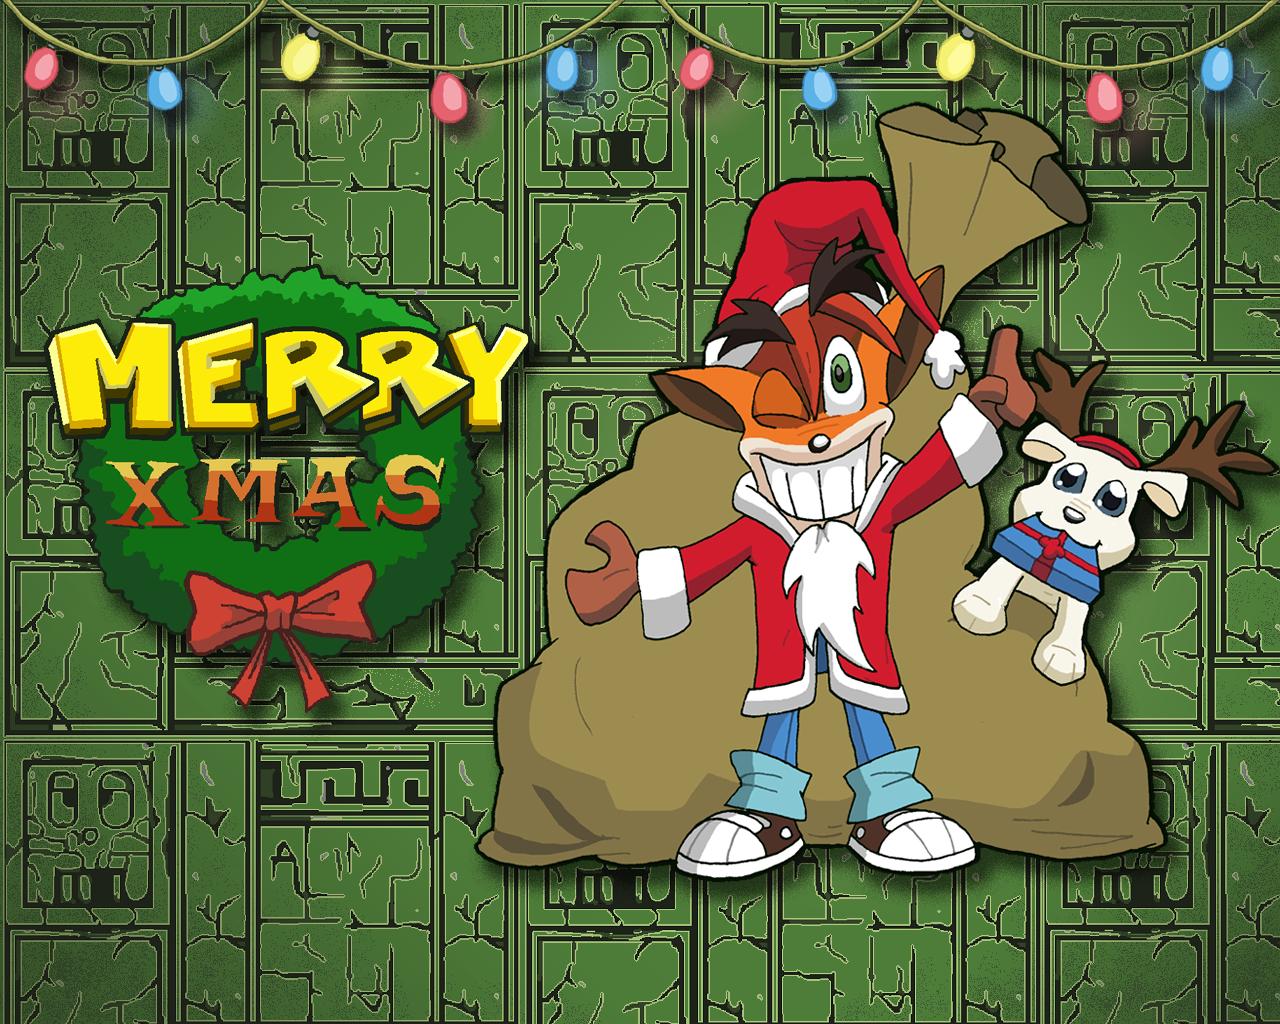 fond d'écran - Christmas